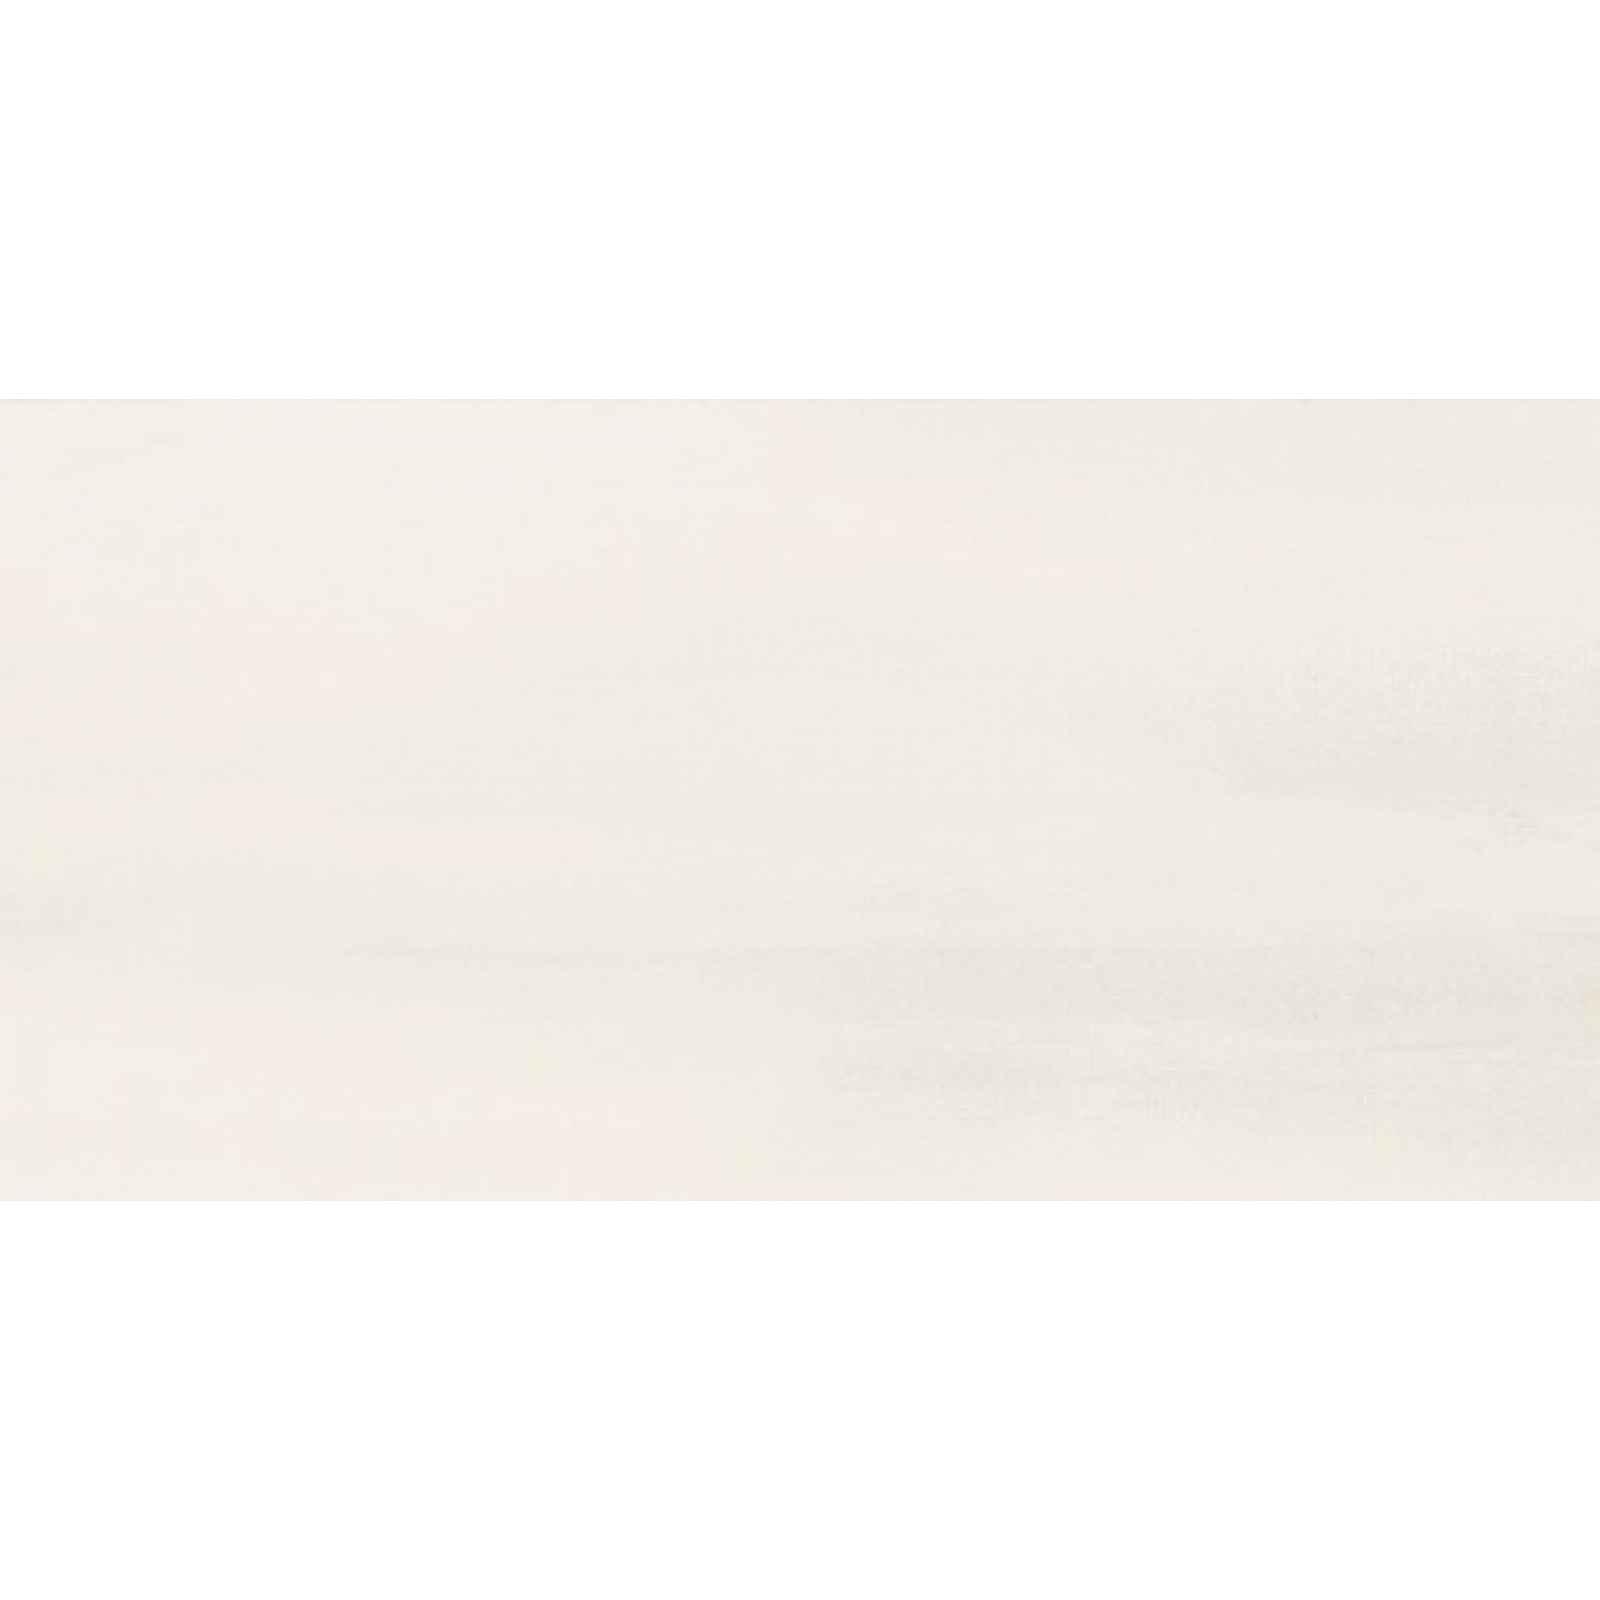 Obklad RAKO Poem světle šedá 30x60 cm lesk WADV4575.1